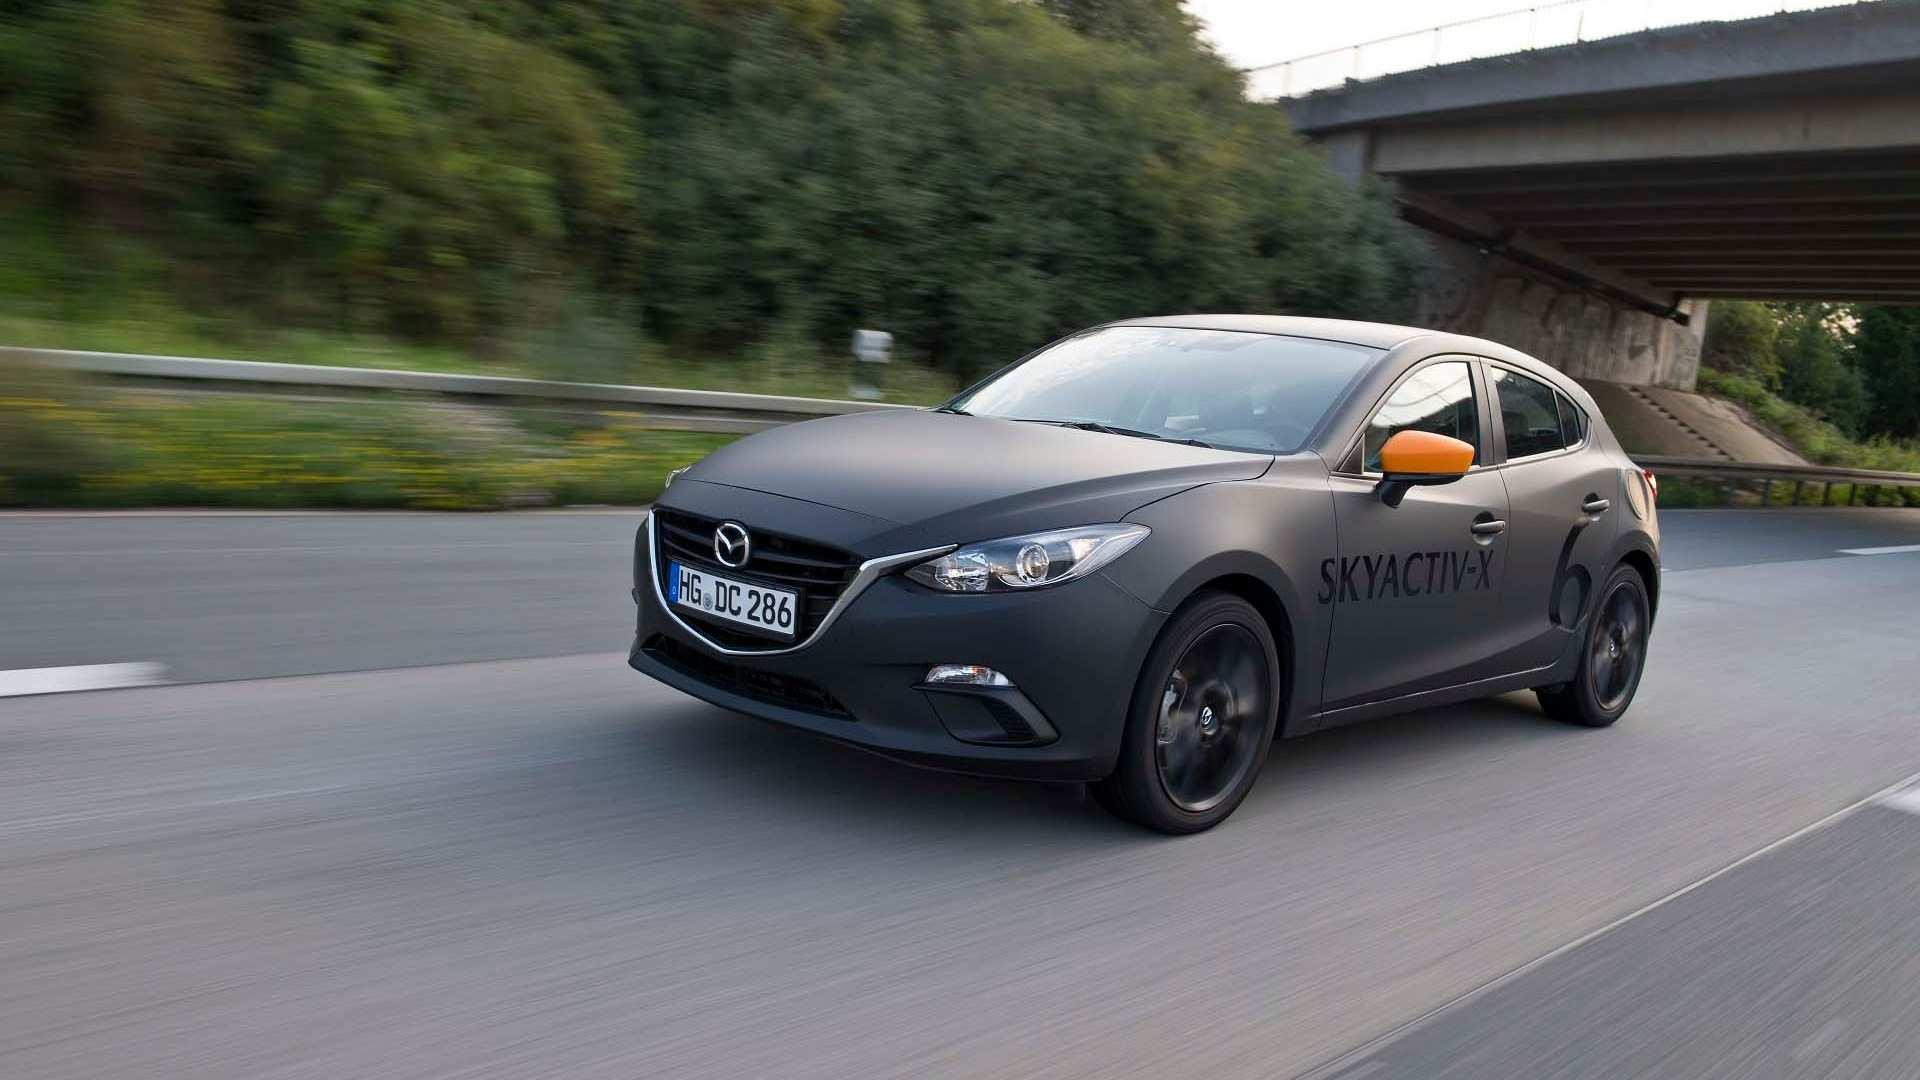 76 Gallery of Motor Mazda 2020 Price and Review for Motor Mazda 2020